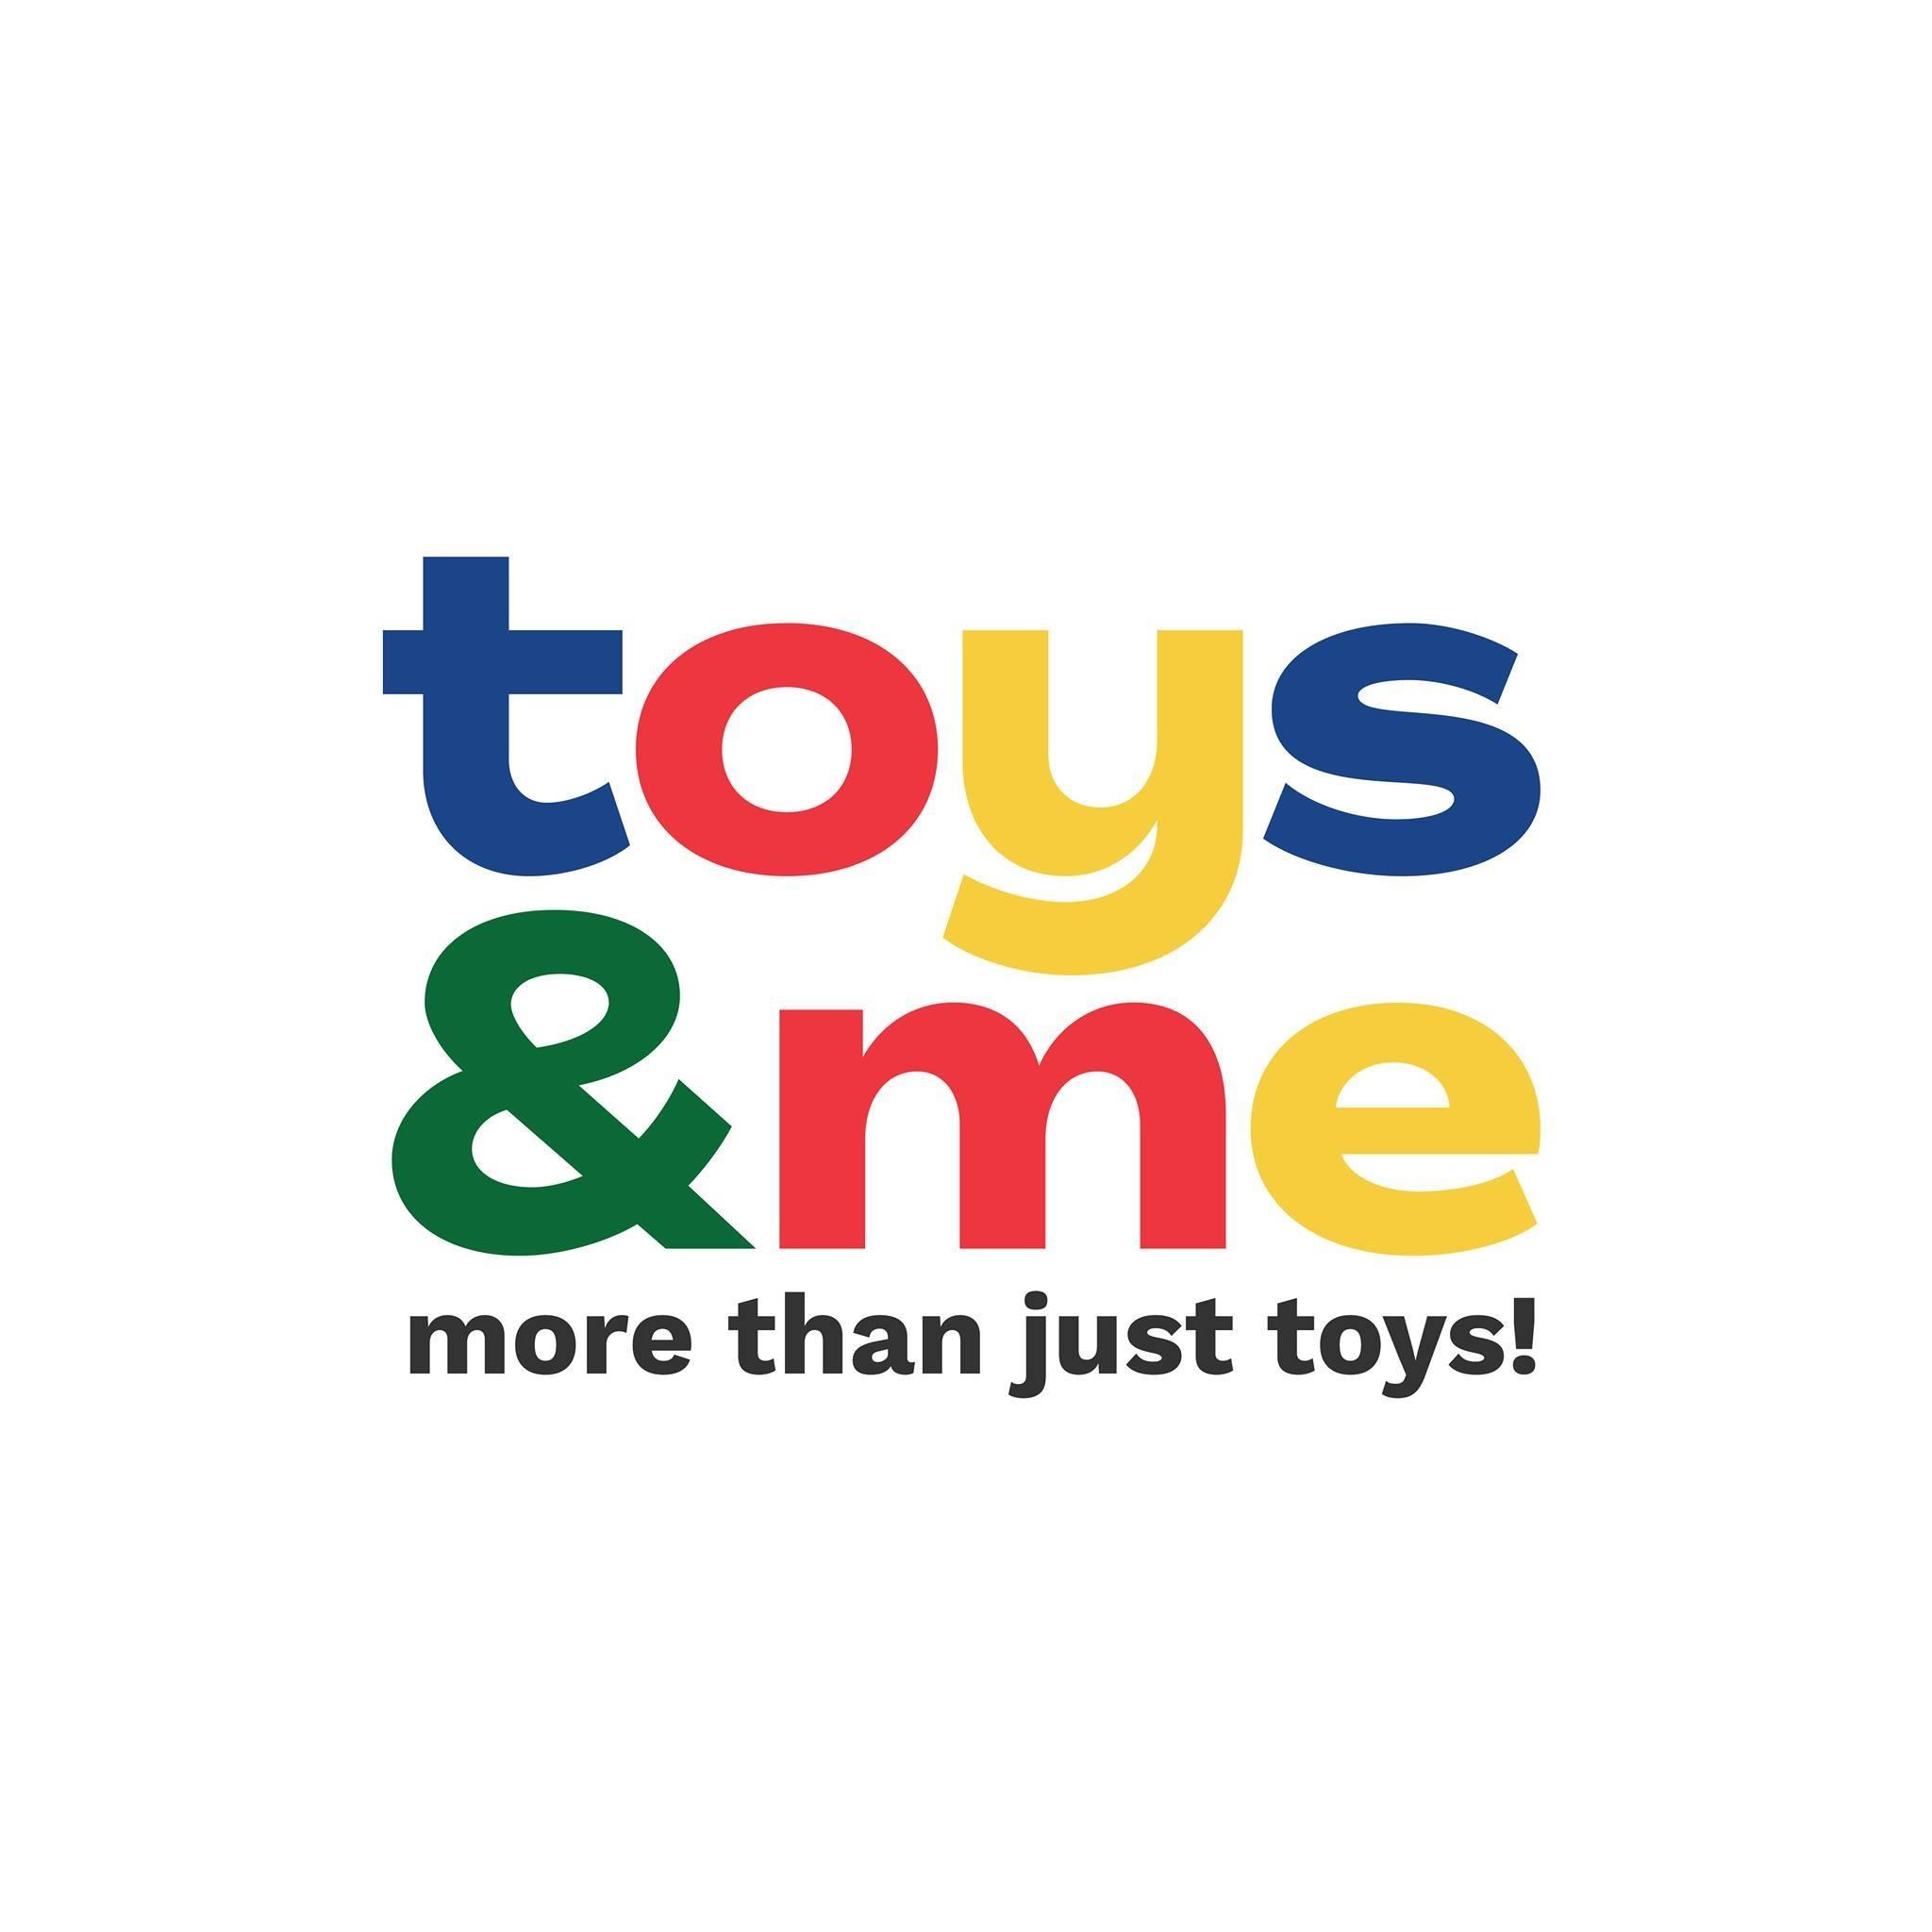 https://www.api.hrincjobs.com/media/filer_public/eb/16/eb161c3a-e44d-4a72-8f91-ad69aa675871/toys.jpg